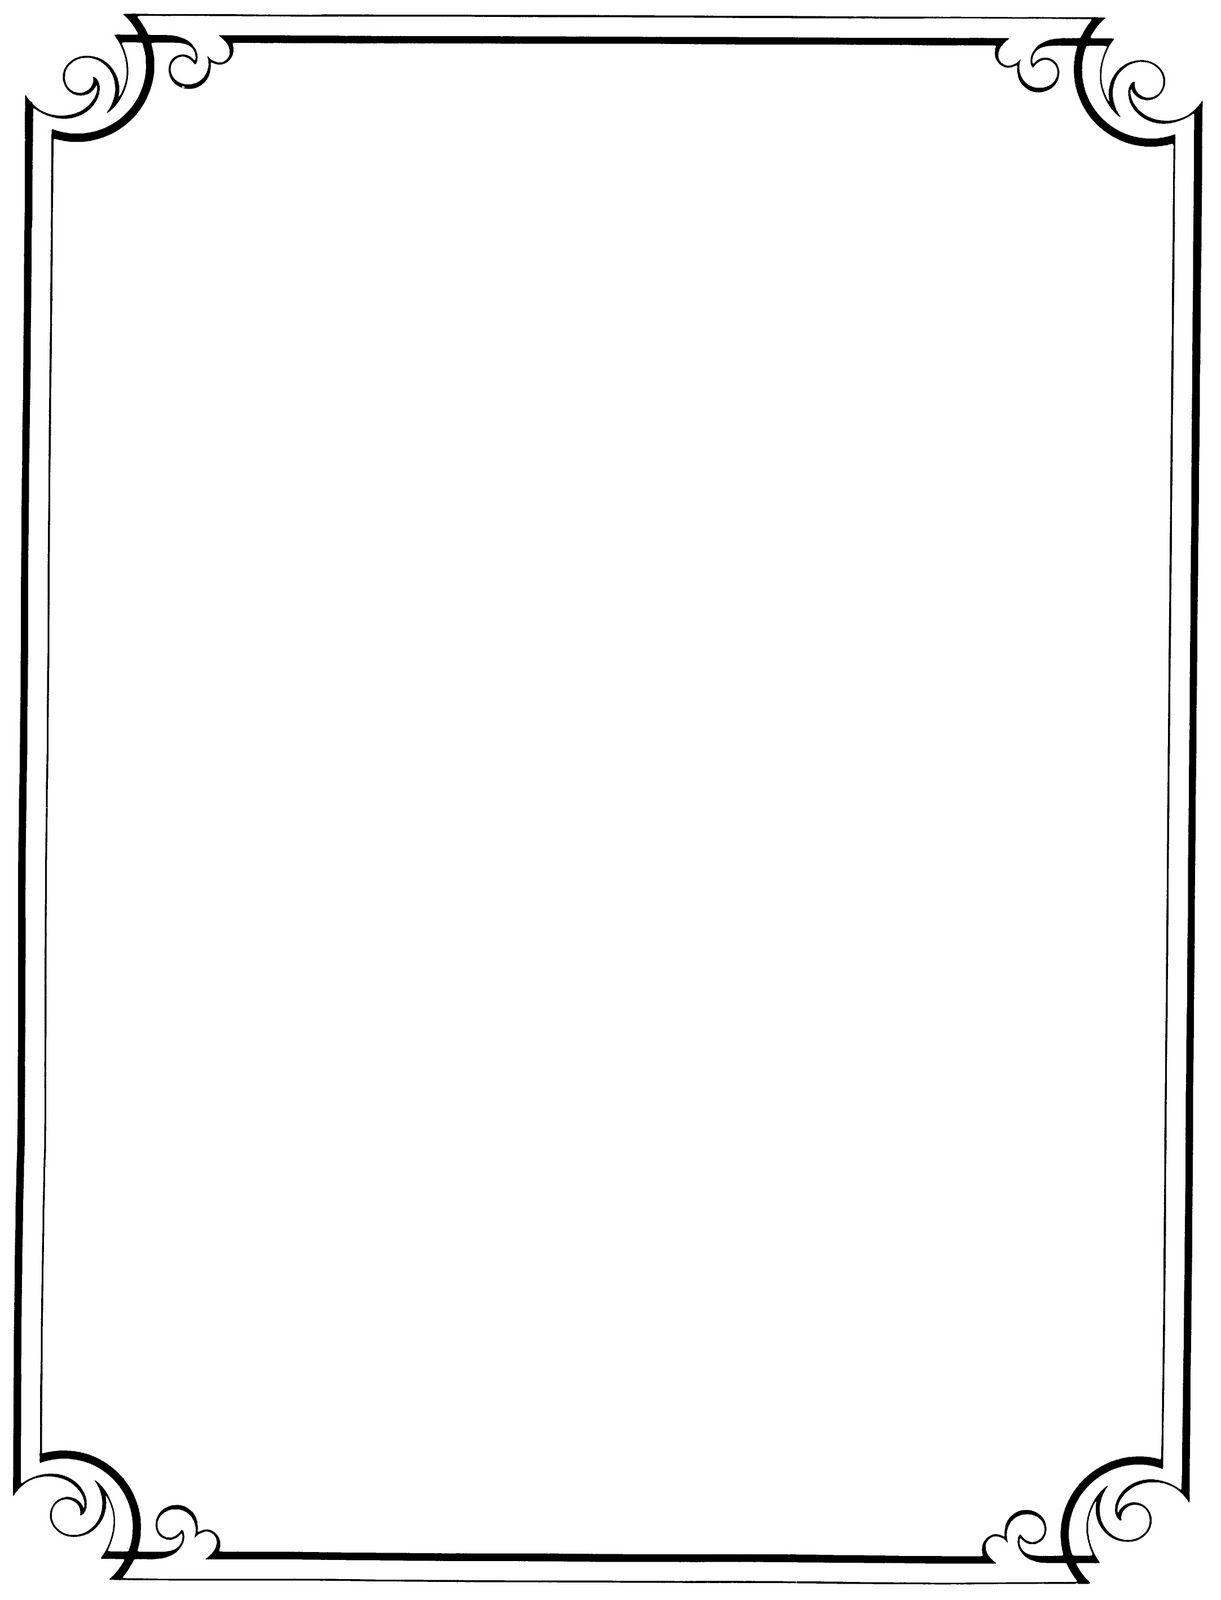 Free Printable Clip Art Borders |  : Free Vintage Clip Art - Free Printable Border Paper